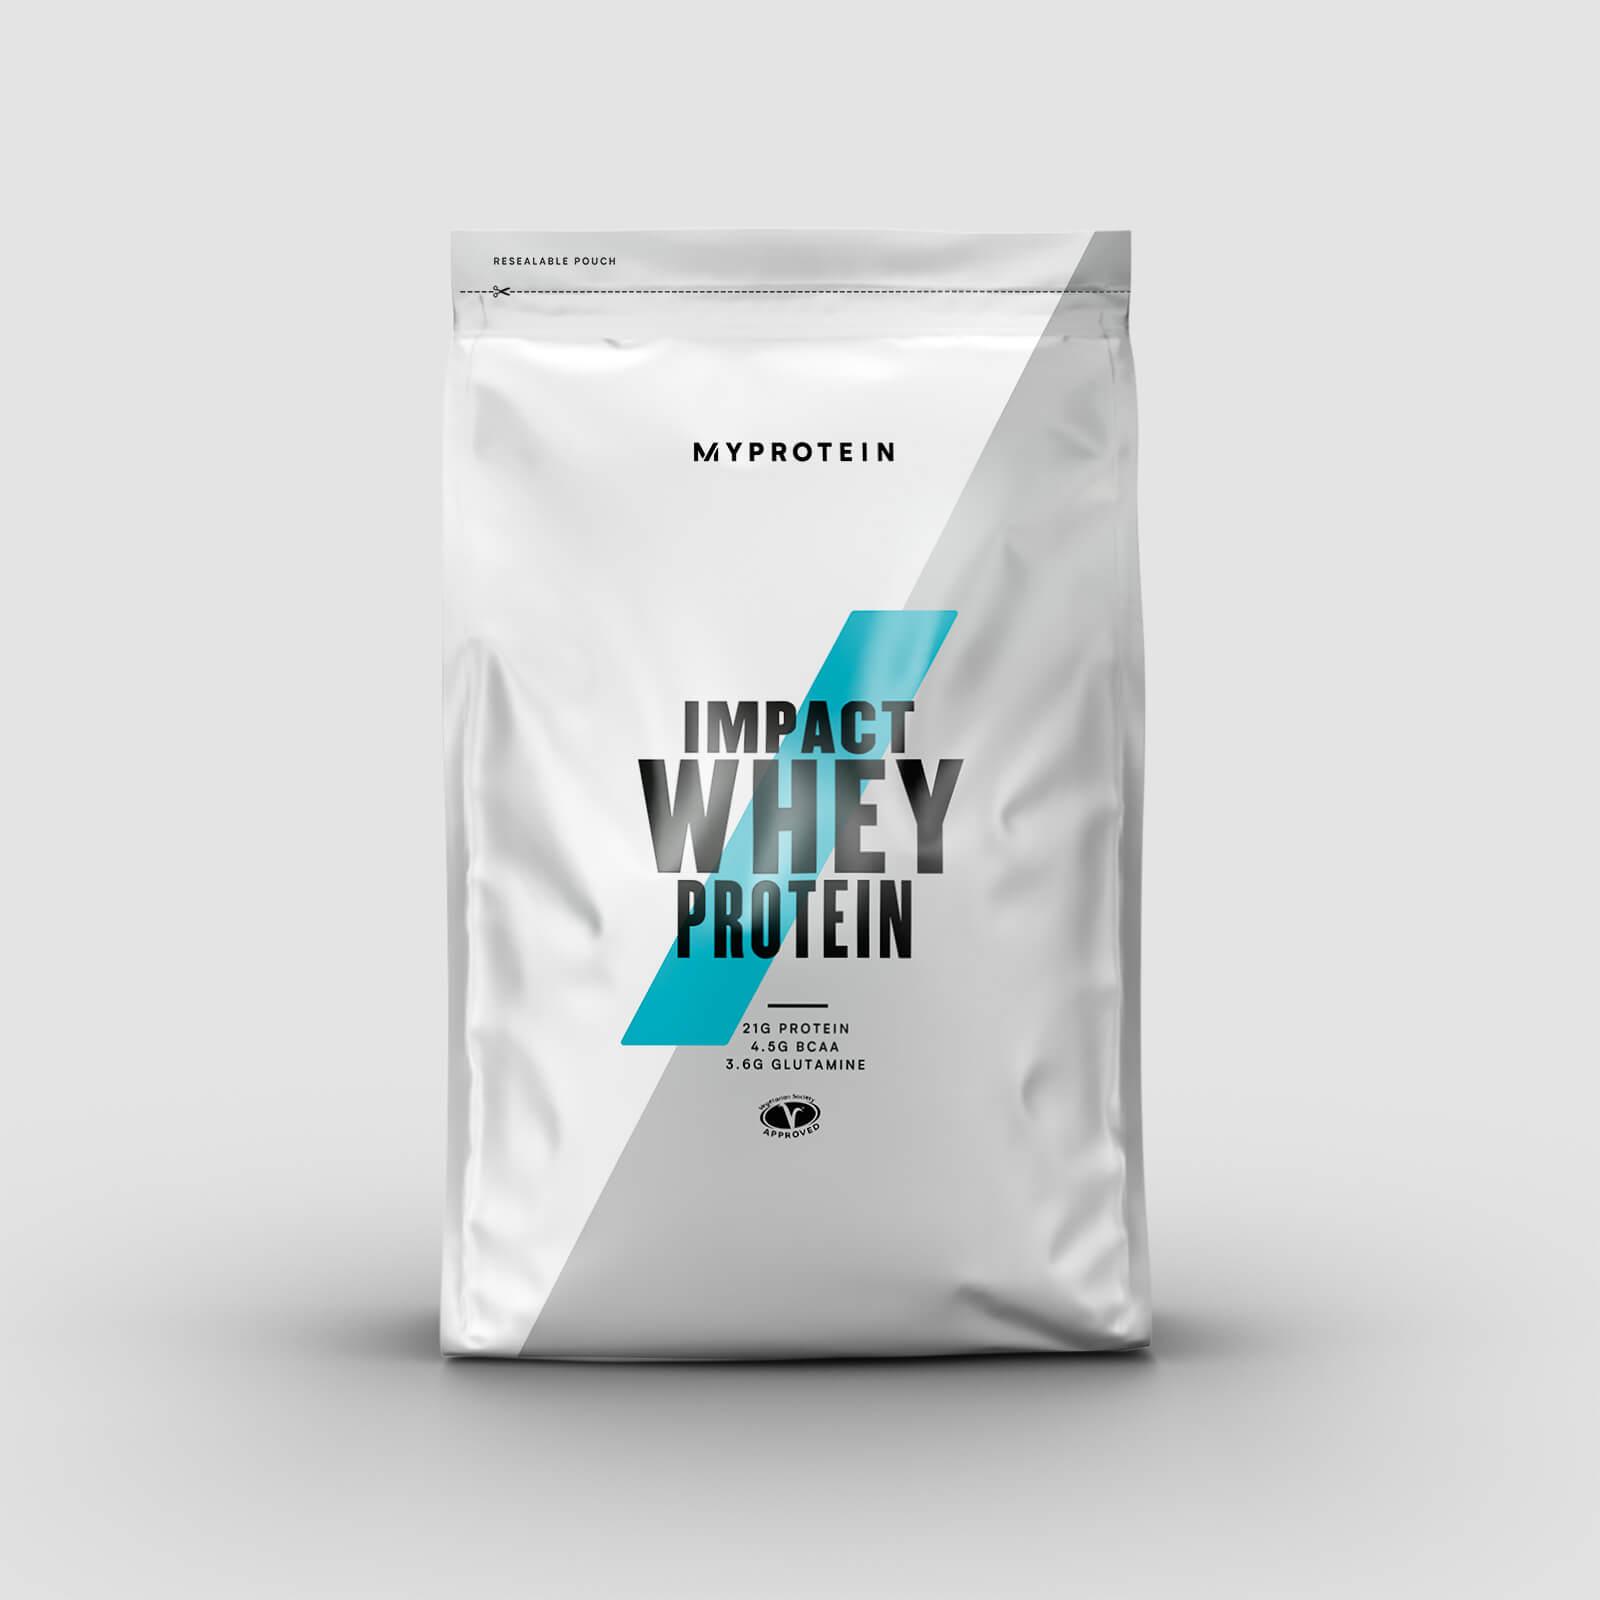 Myprotein Impact Whey Protein - 1kg - Chocolat Caramel